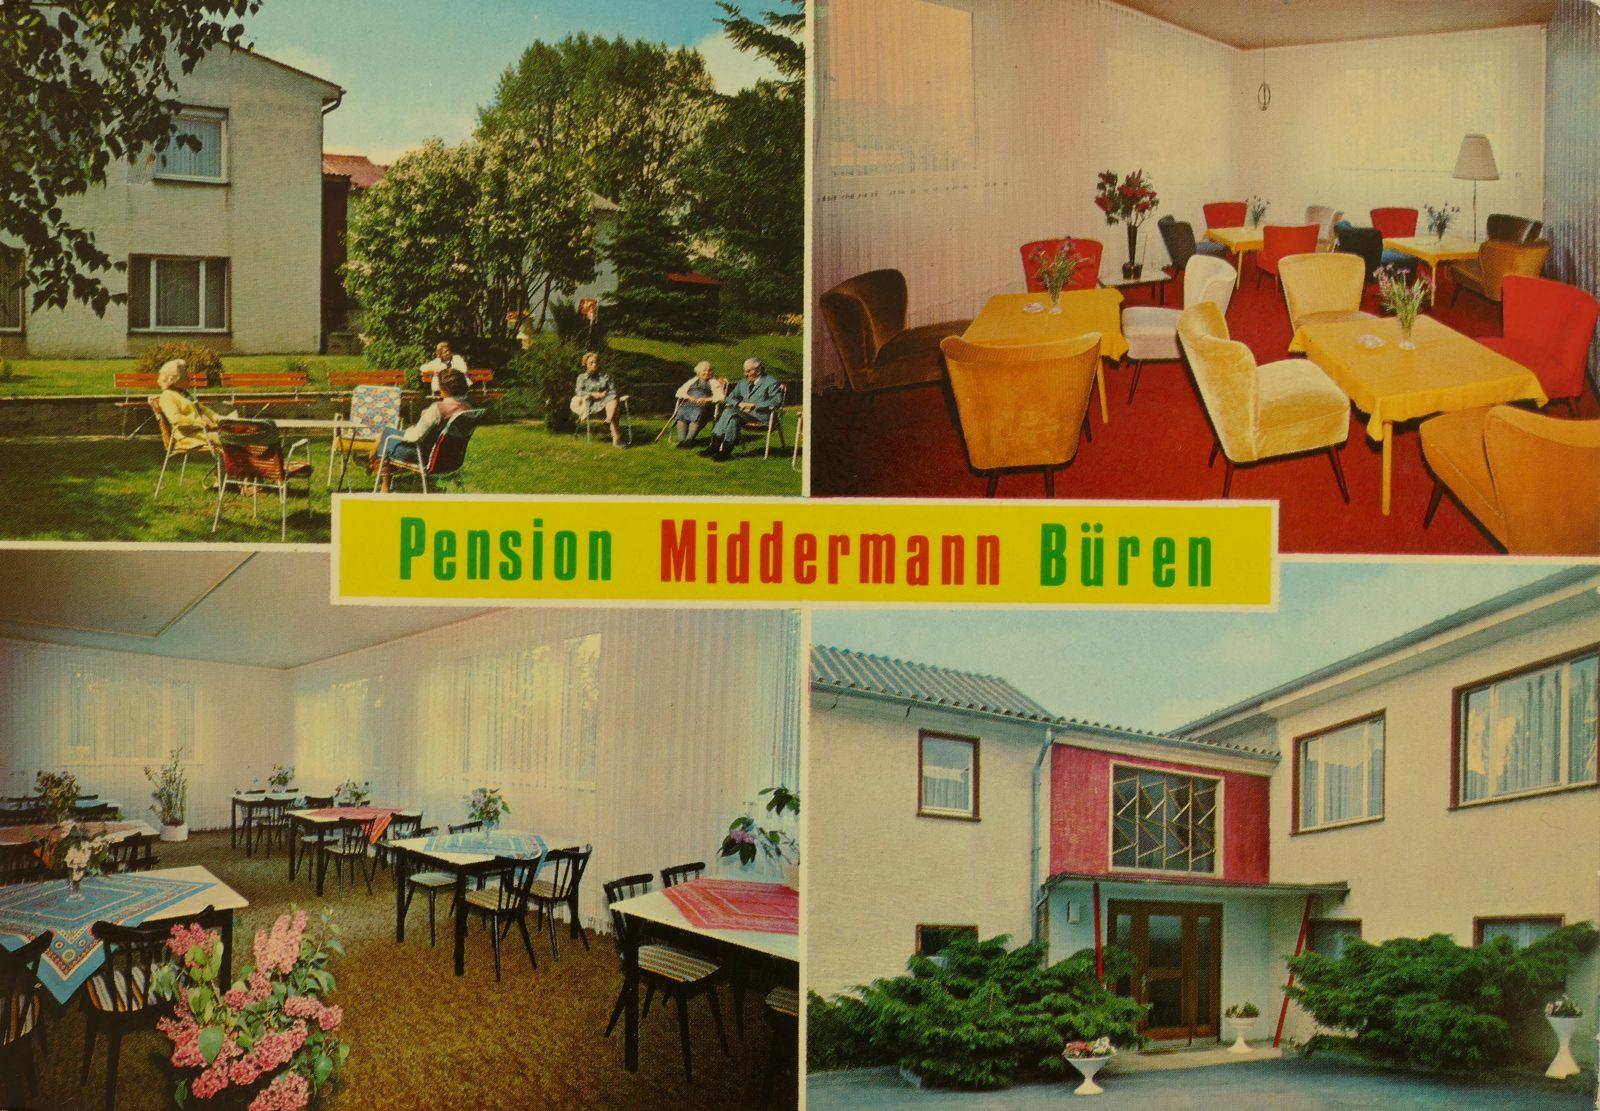 Pension Middermann in den 1970ern (Neubrückenstraße)